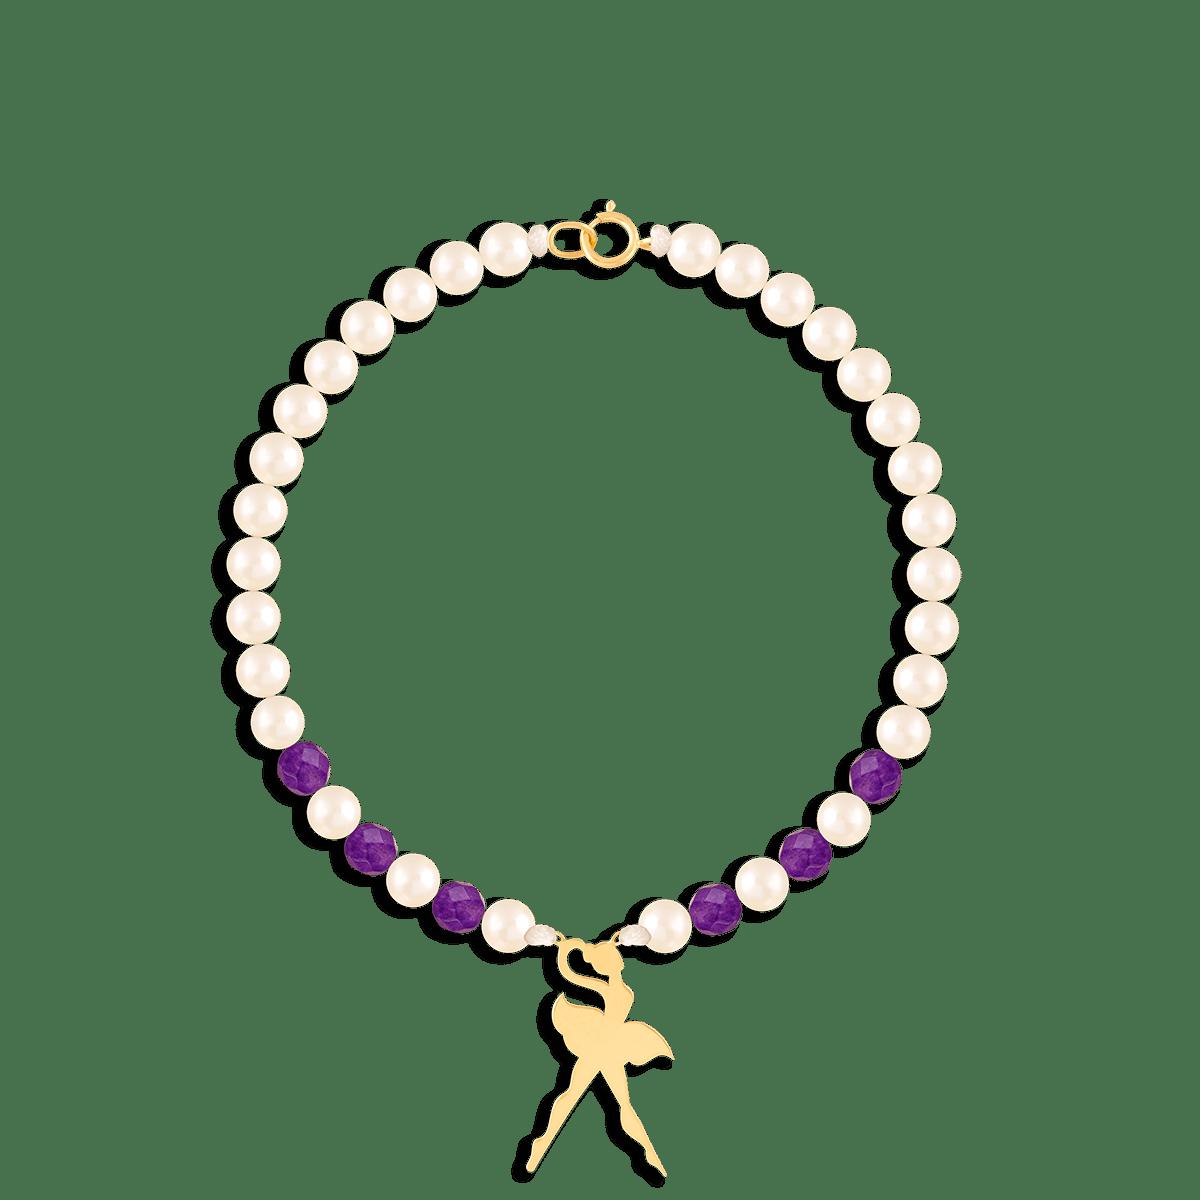 دستبند طلا سنگی رقص باله